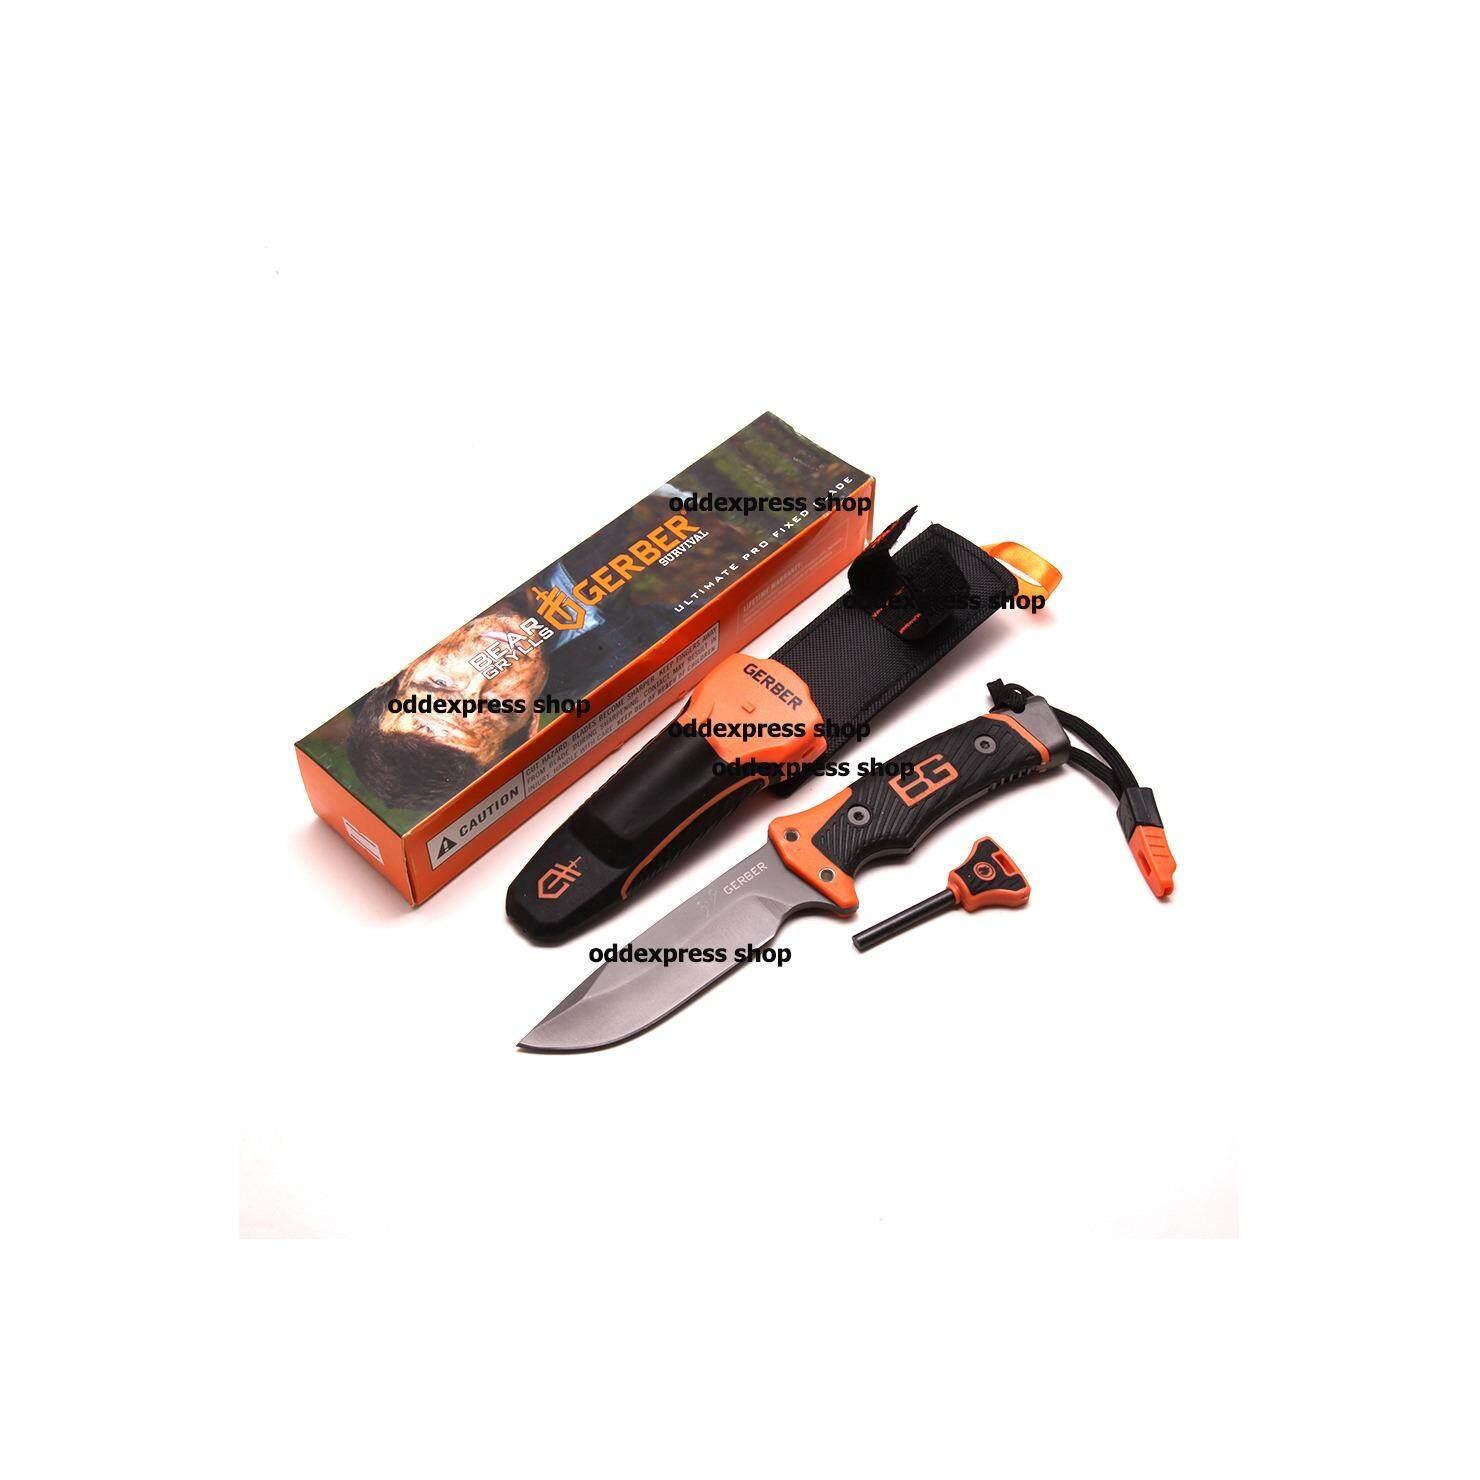 100 Gerber Bear Grylls Ultimate Pro Fixed Blade มีดพก ใบมีดพับไม่ได้ยาว 10 นิ้ว ถูก